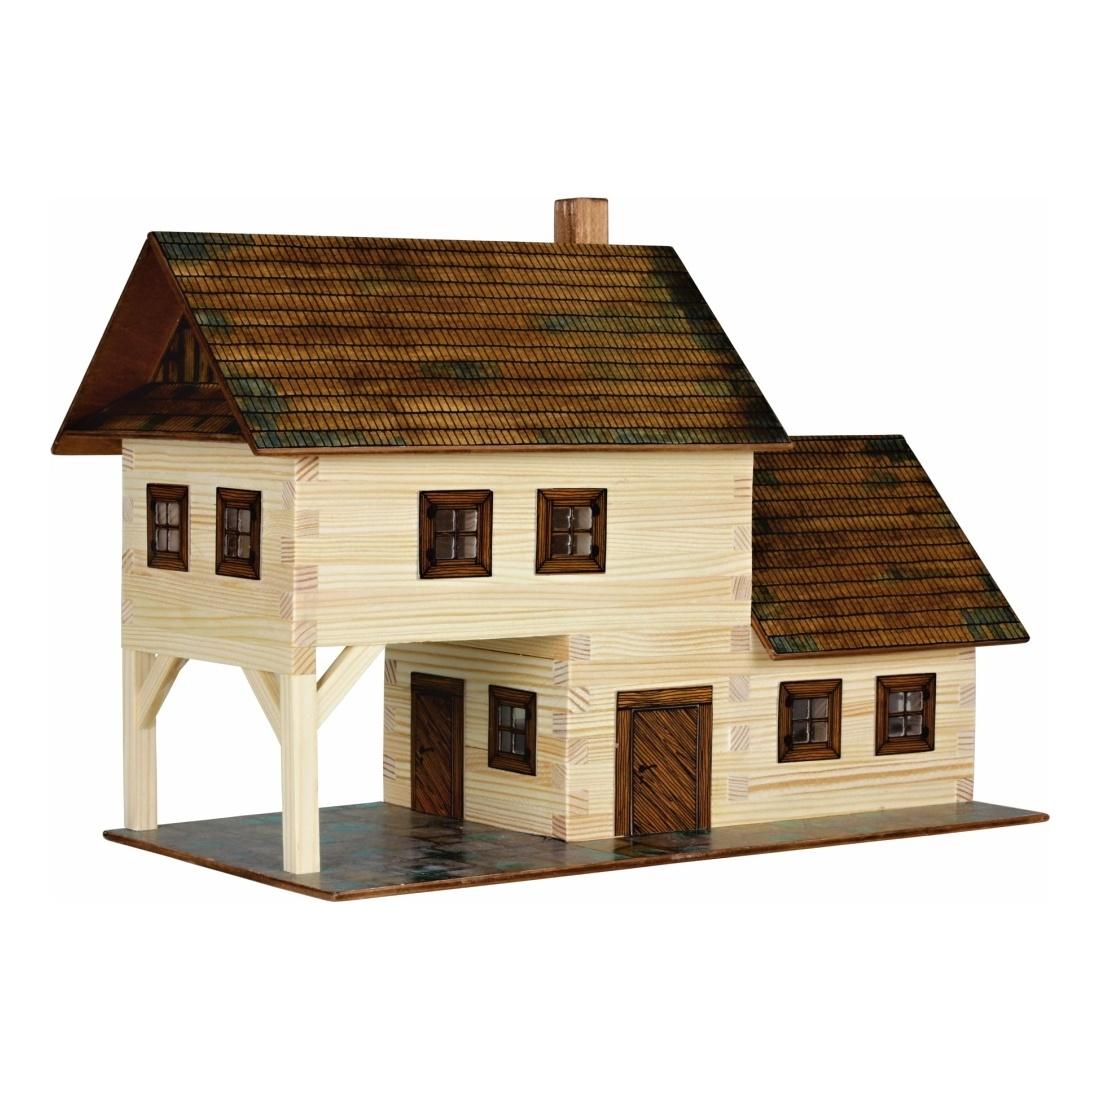 Walachia Dřevěná slepovací stavebnice Hospoda